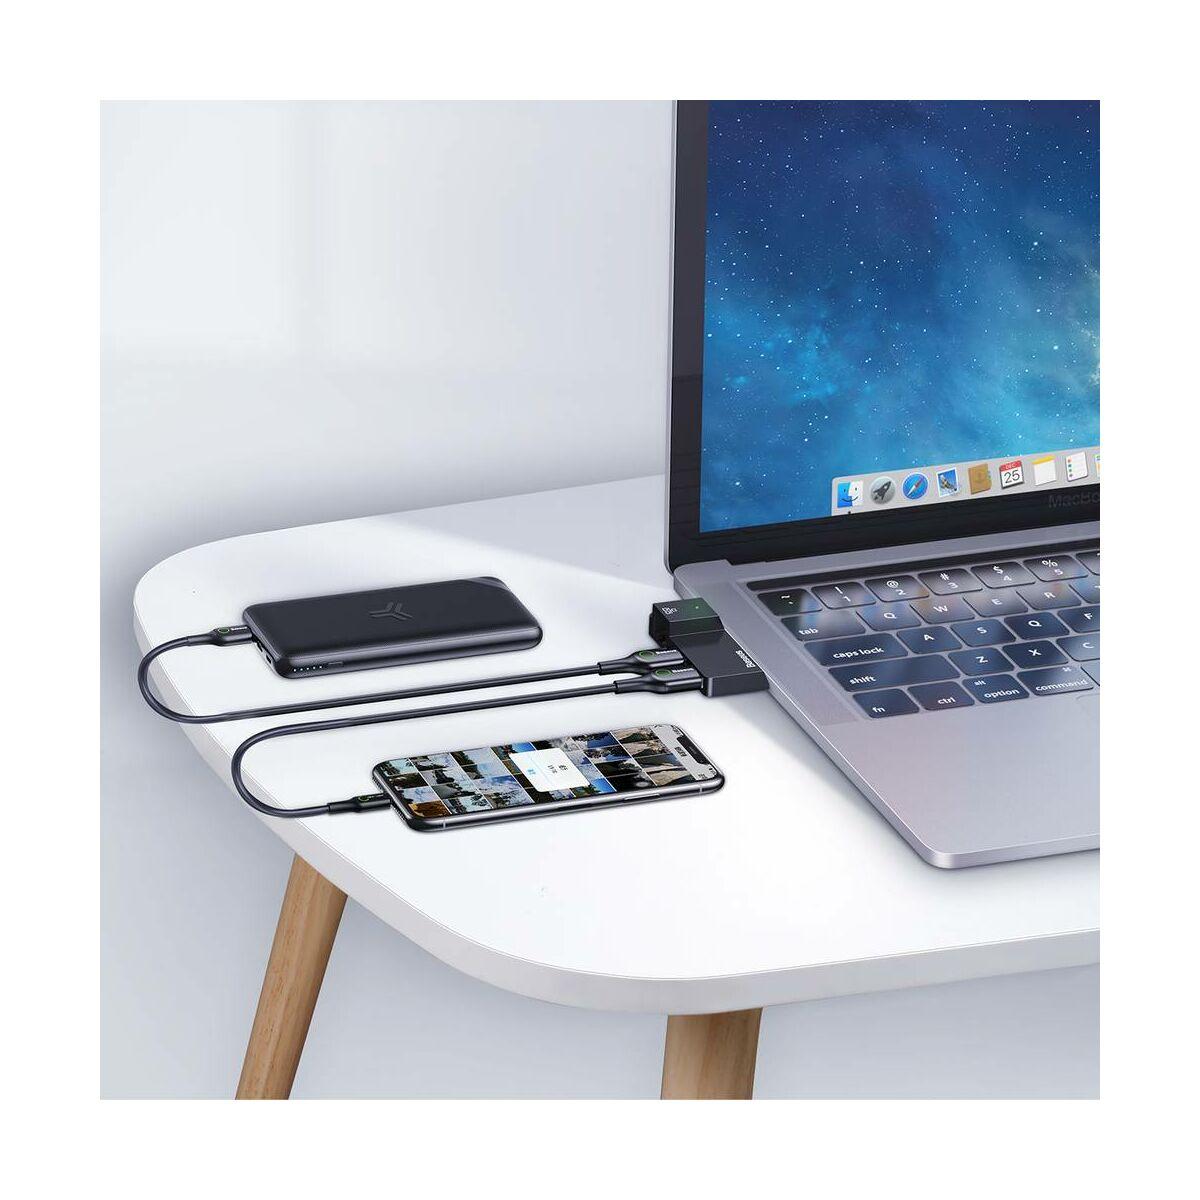 Baseus HUB, Multifunctional Surface Pro eszközhöz, (USB A to RJ45x1 + USB3.0x2), fekete (CAHUB-FP01)